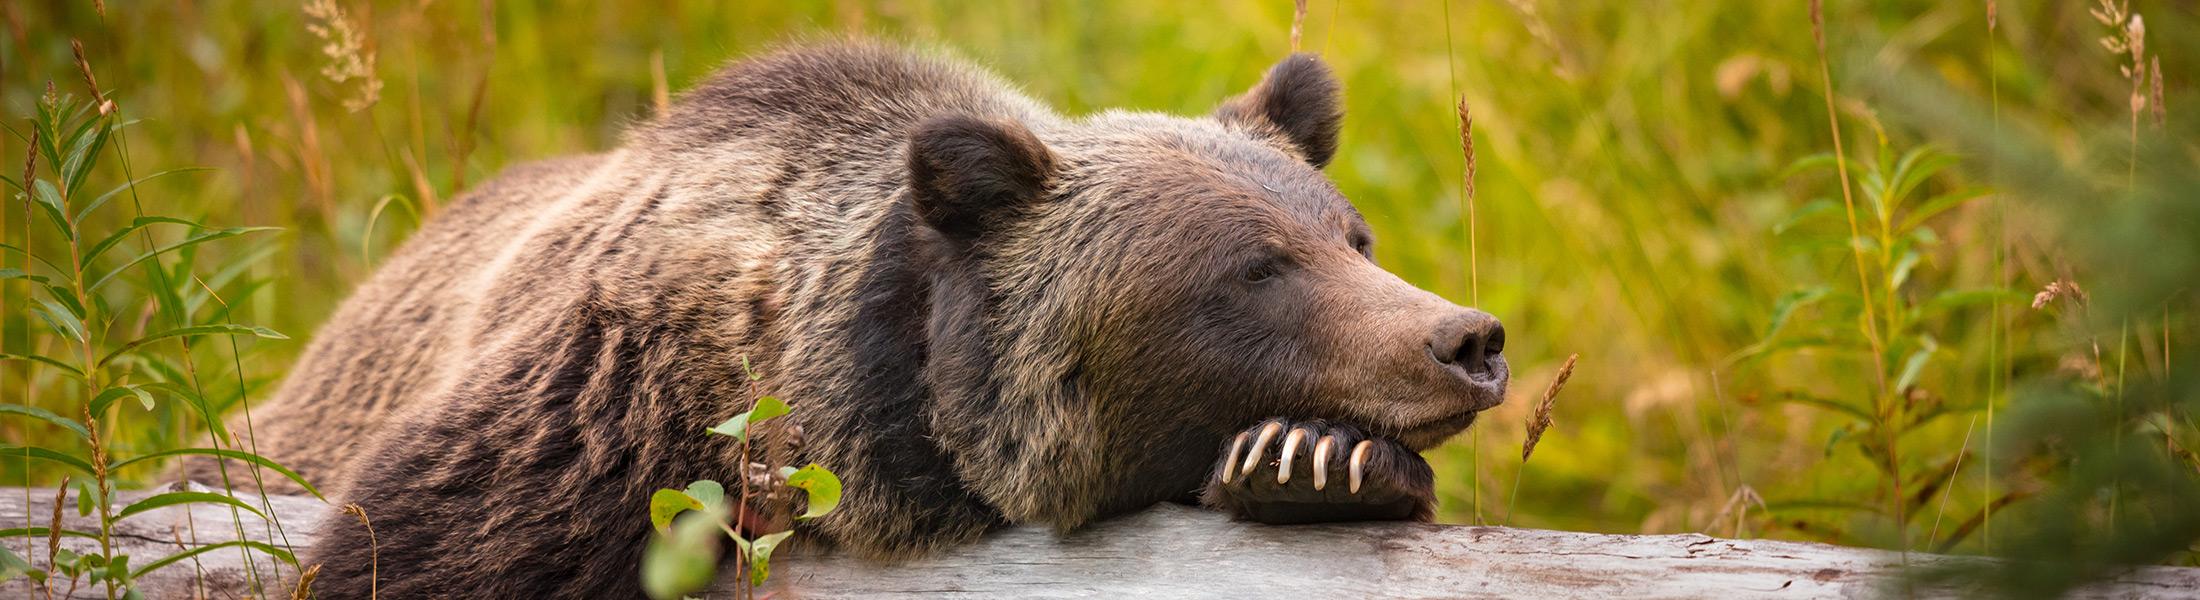 Bear sleeping in British Columbia